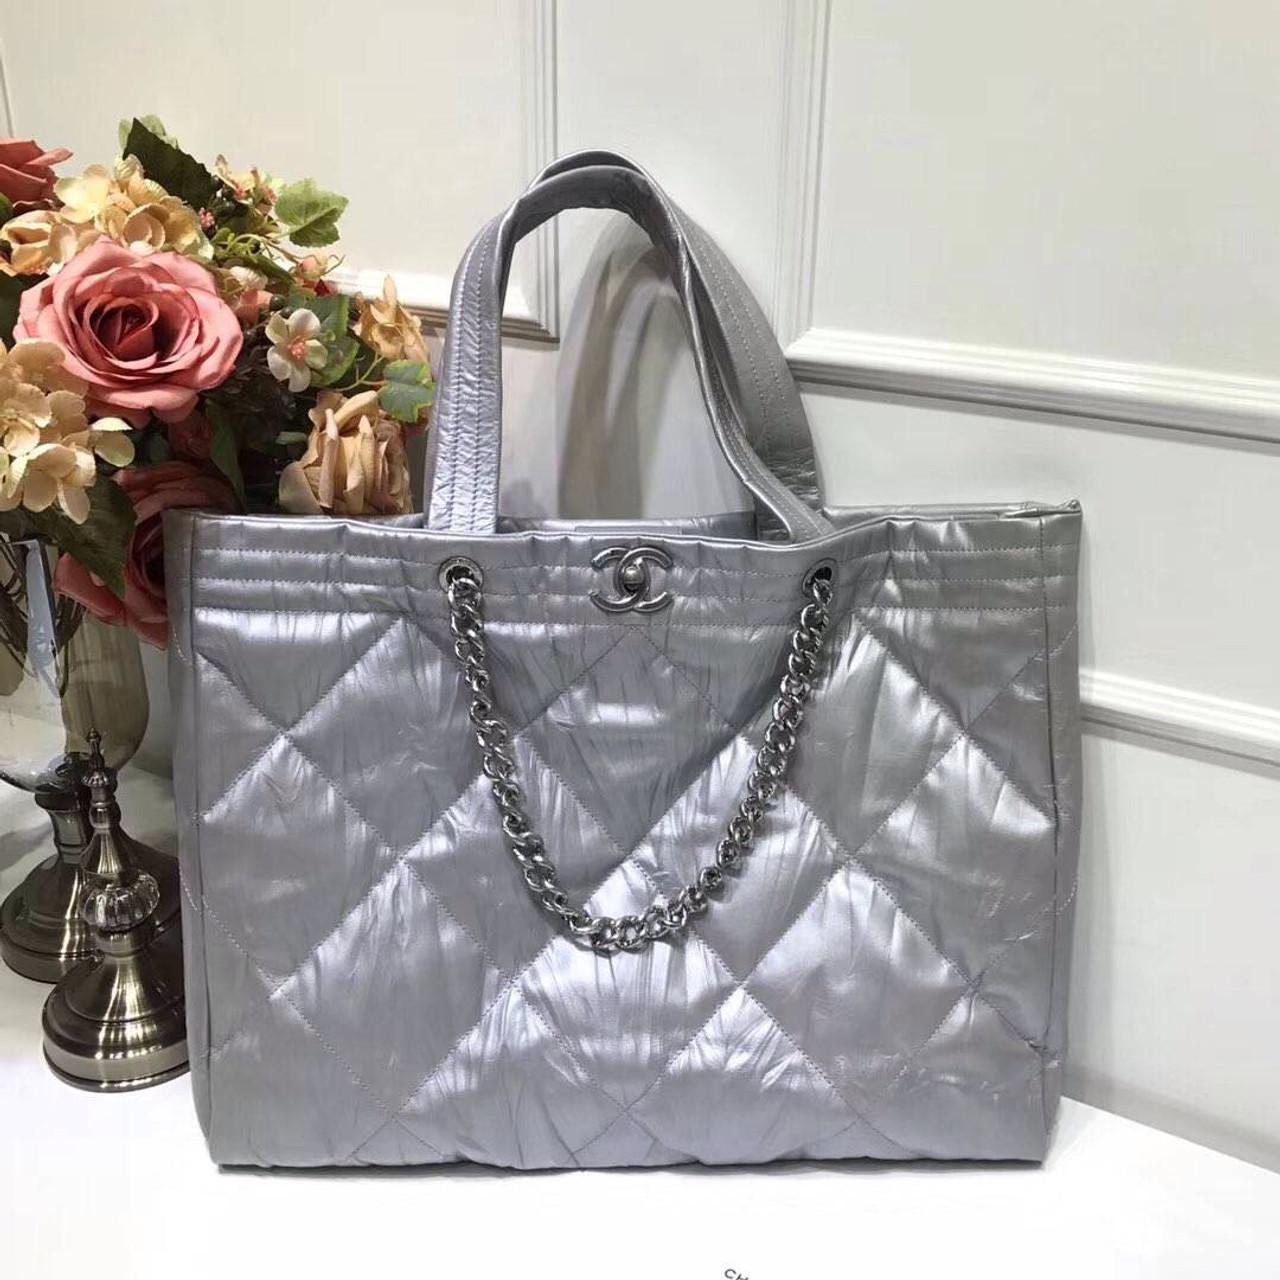 465045c0eb63 Chanel Hobo Handbag Silver F W 2017 - Bella Vita Moda